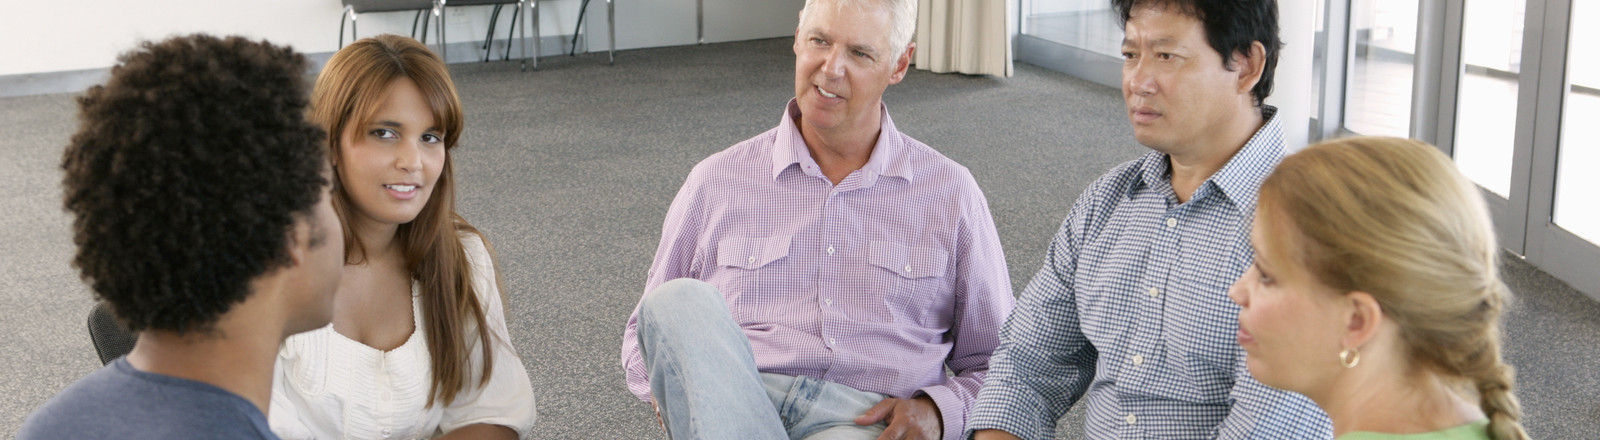 Rehabilitation Counseling Sciences